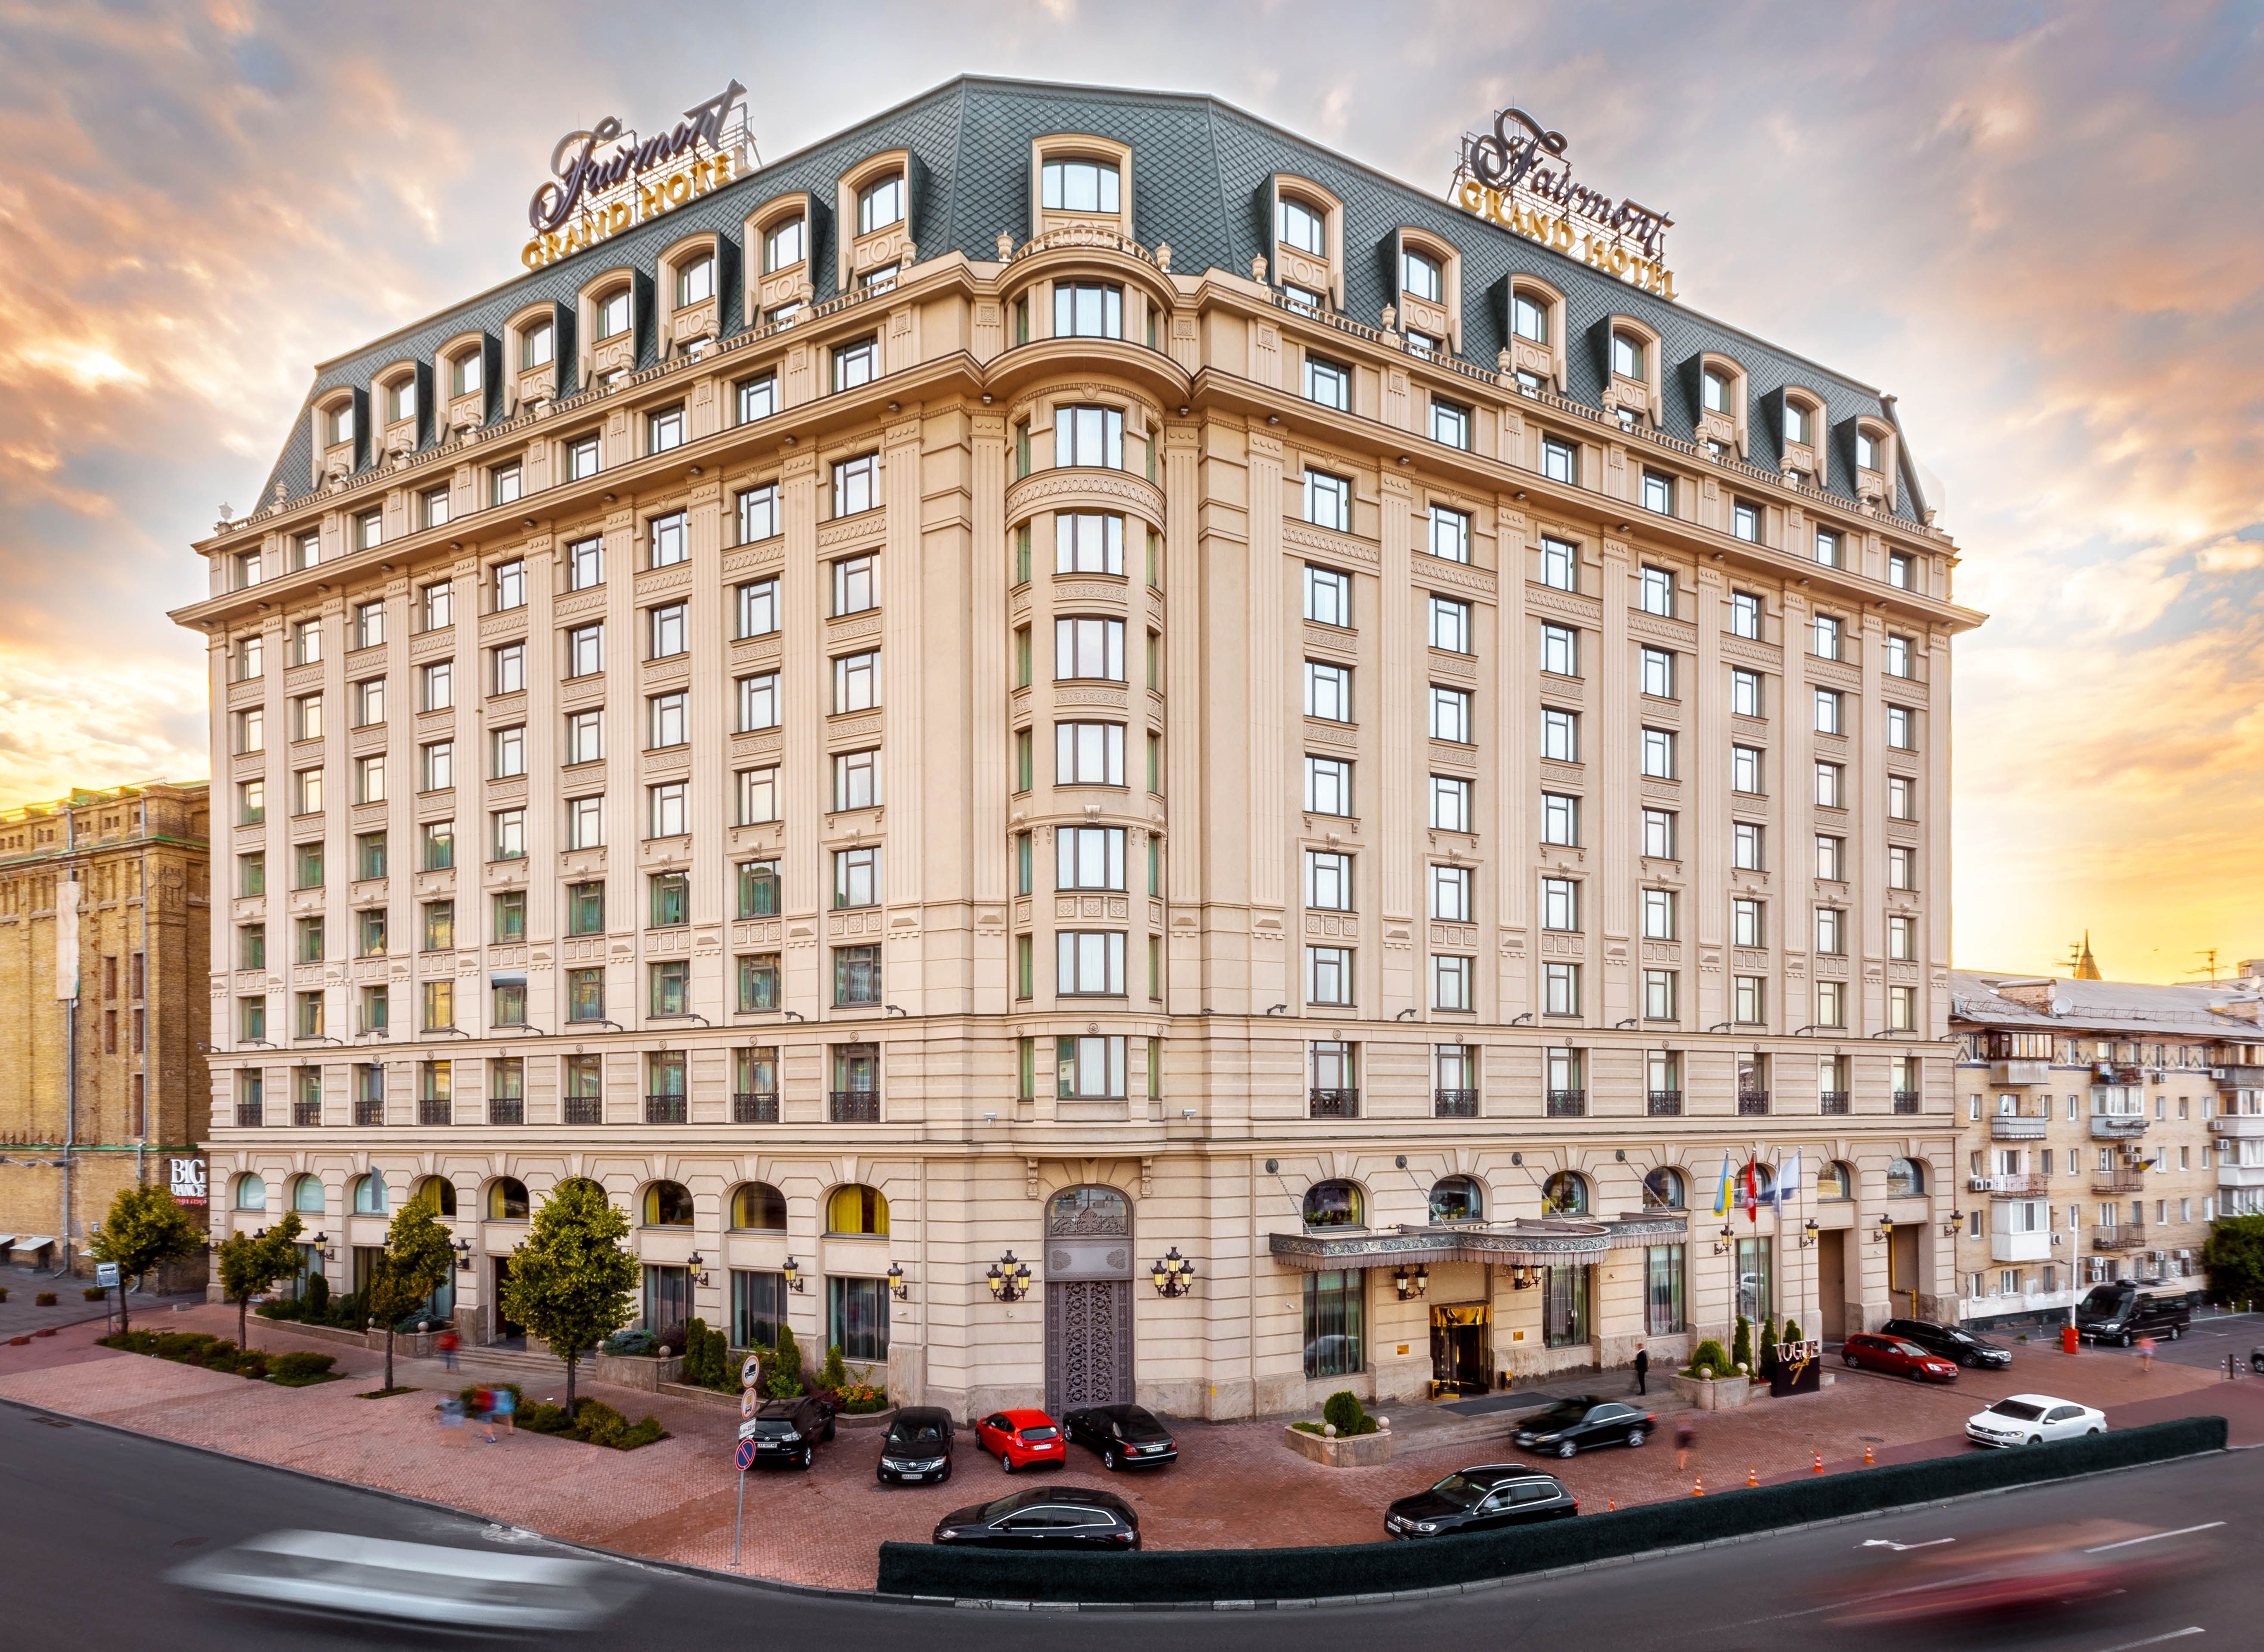 Fairmont Grand Hotel Kyiv Opened Its